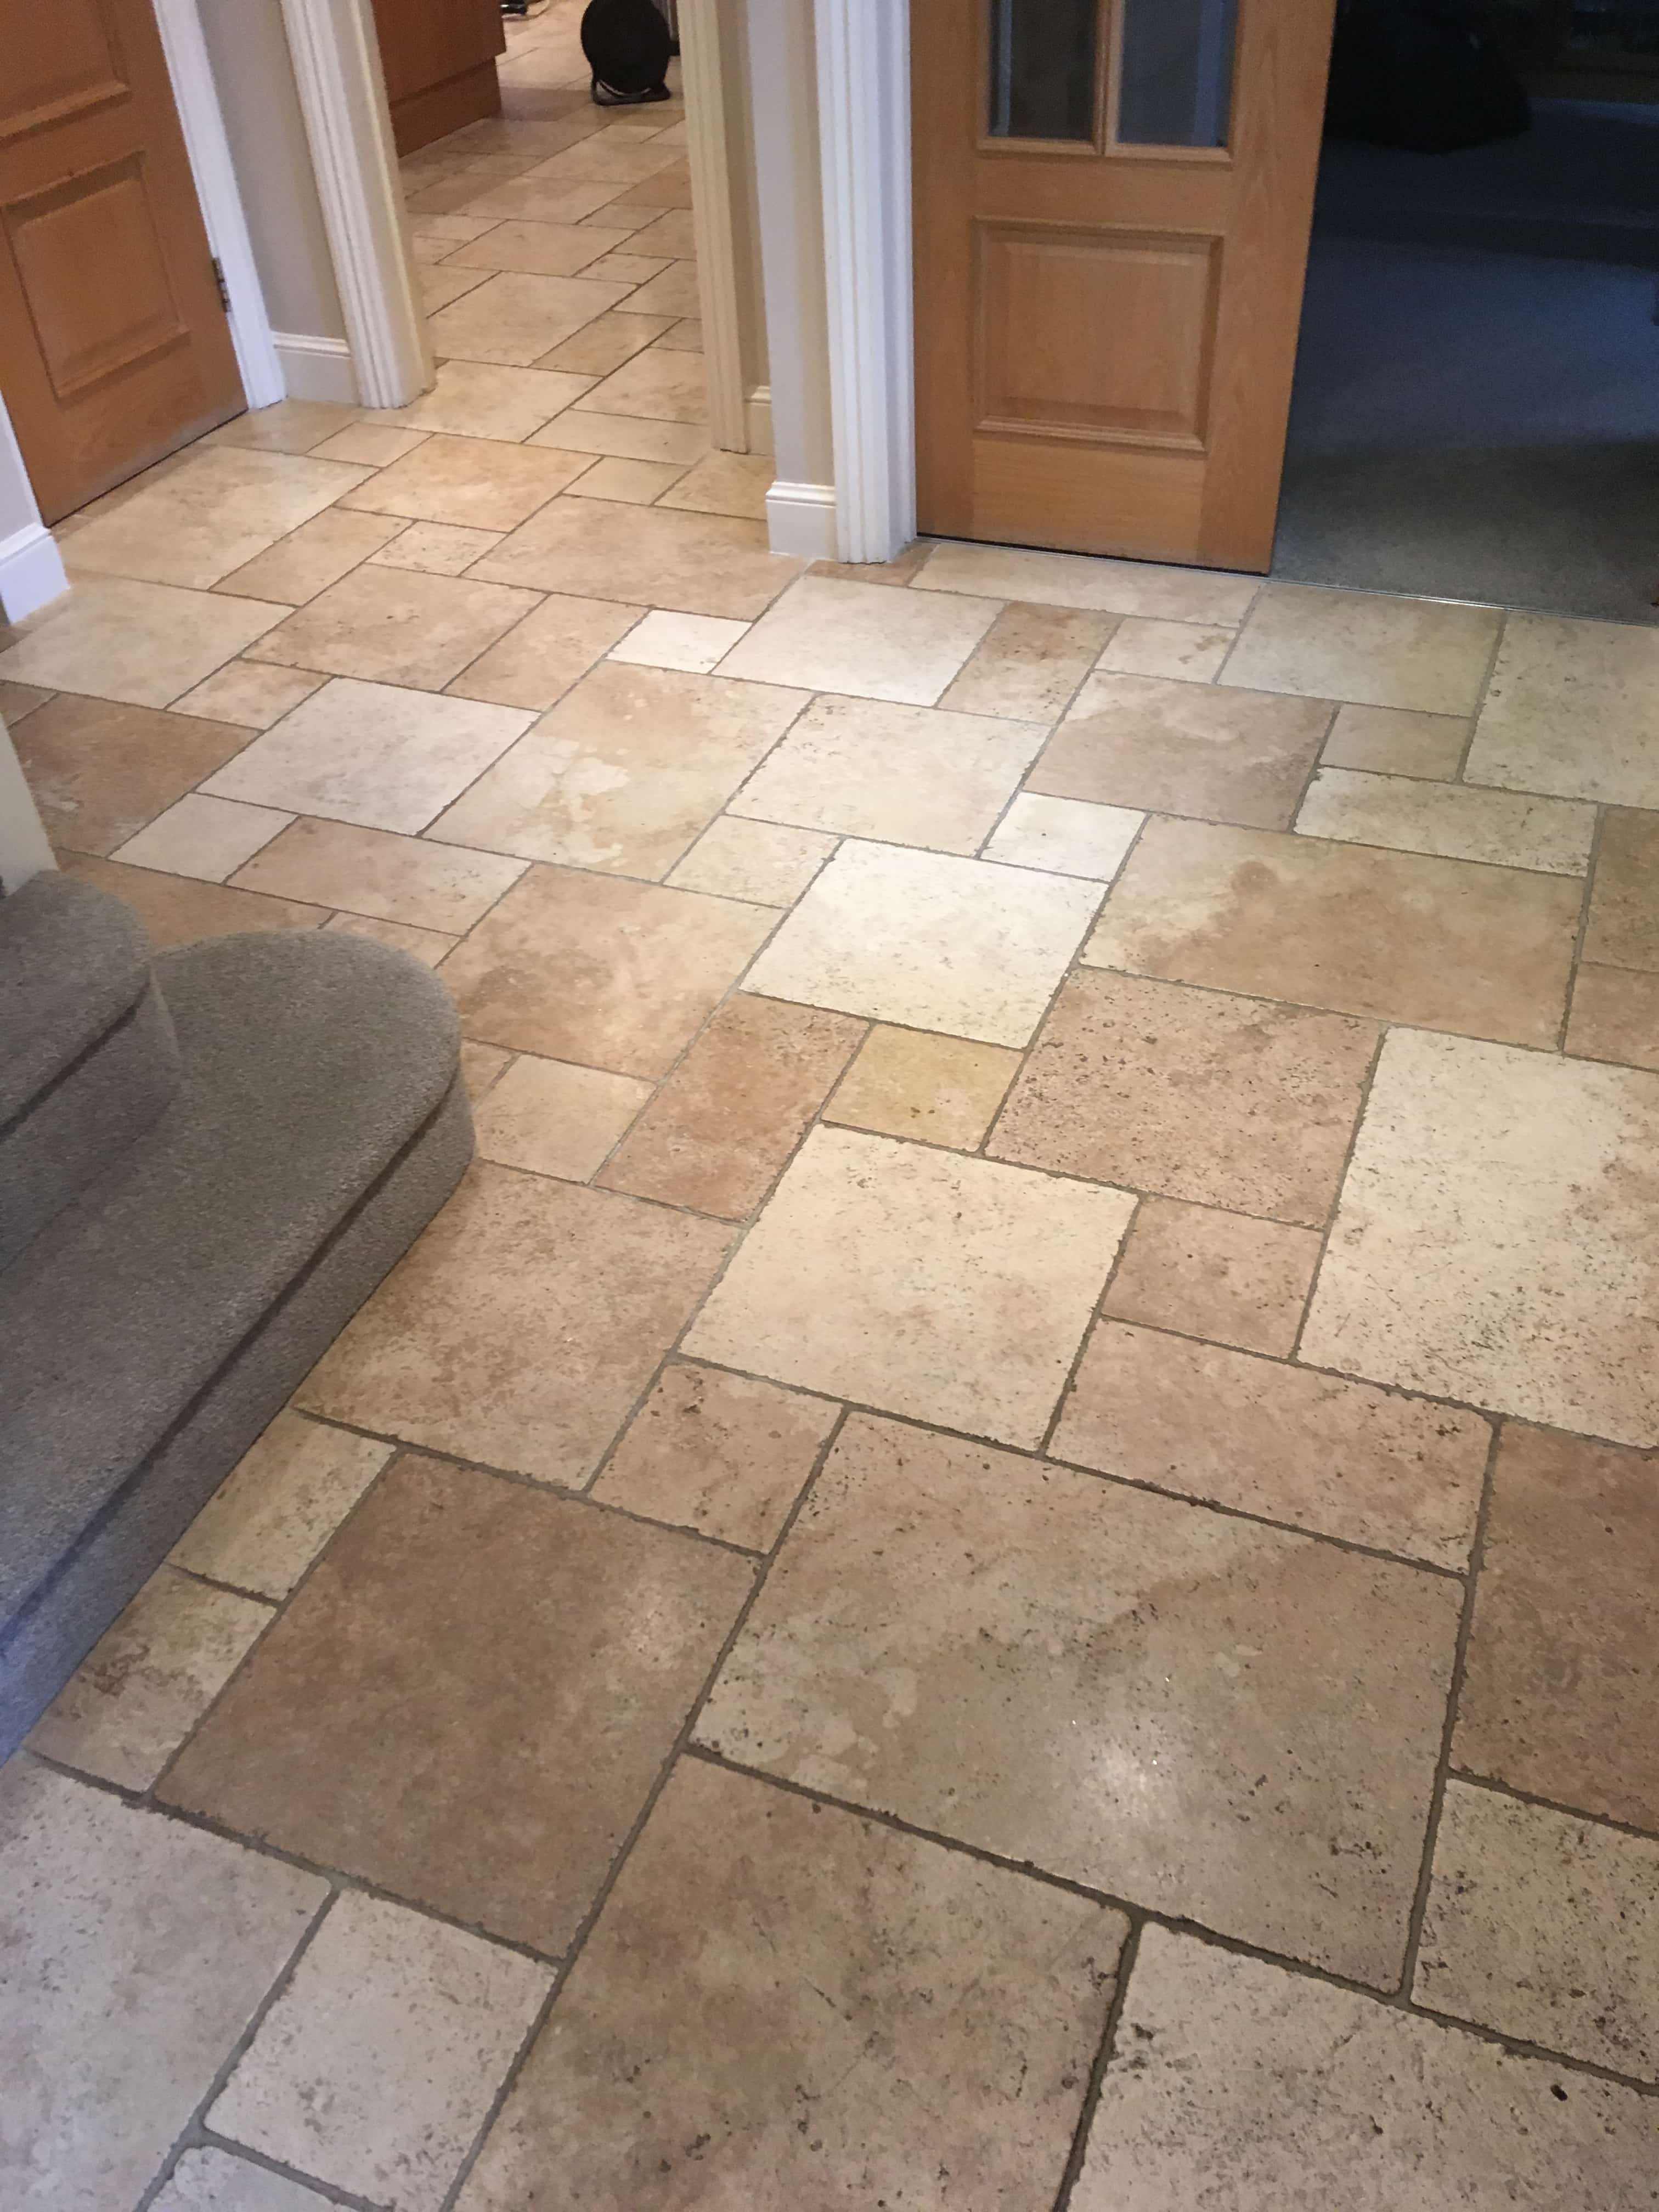 Travertine Tiled Floor Before Cleaning Sunbury-on-Thames